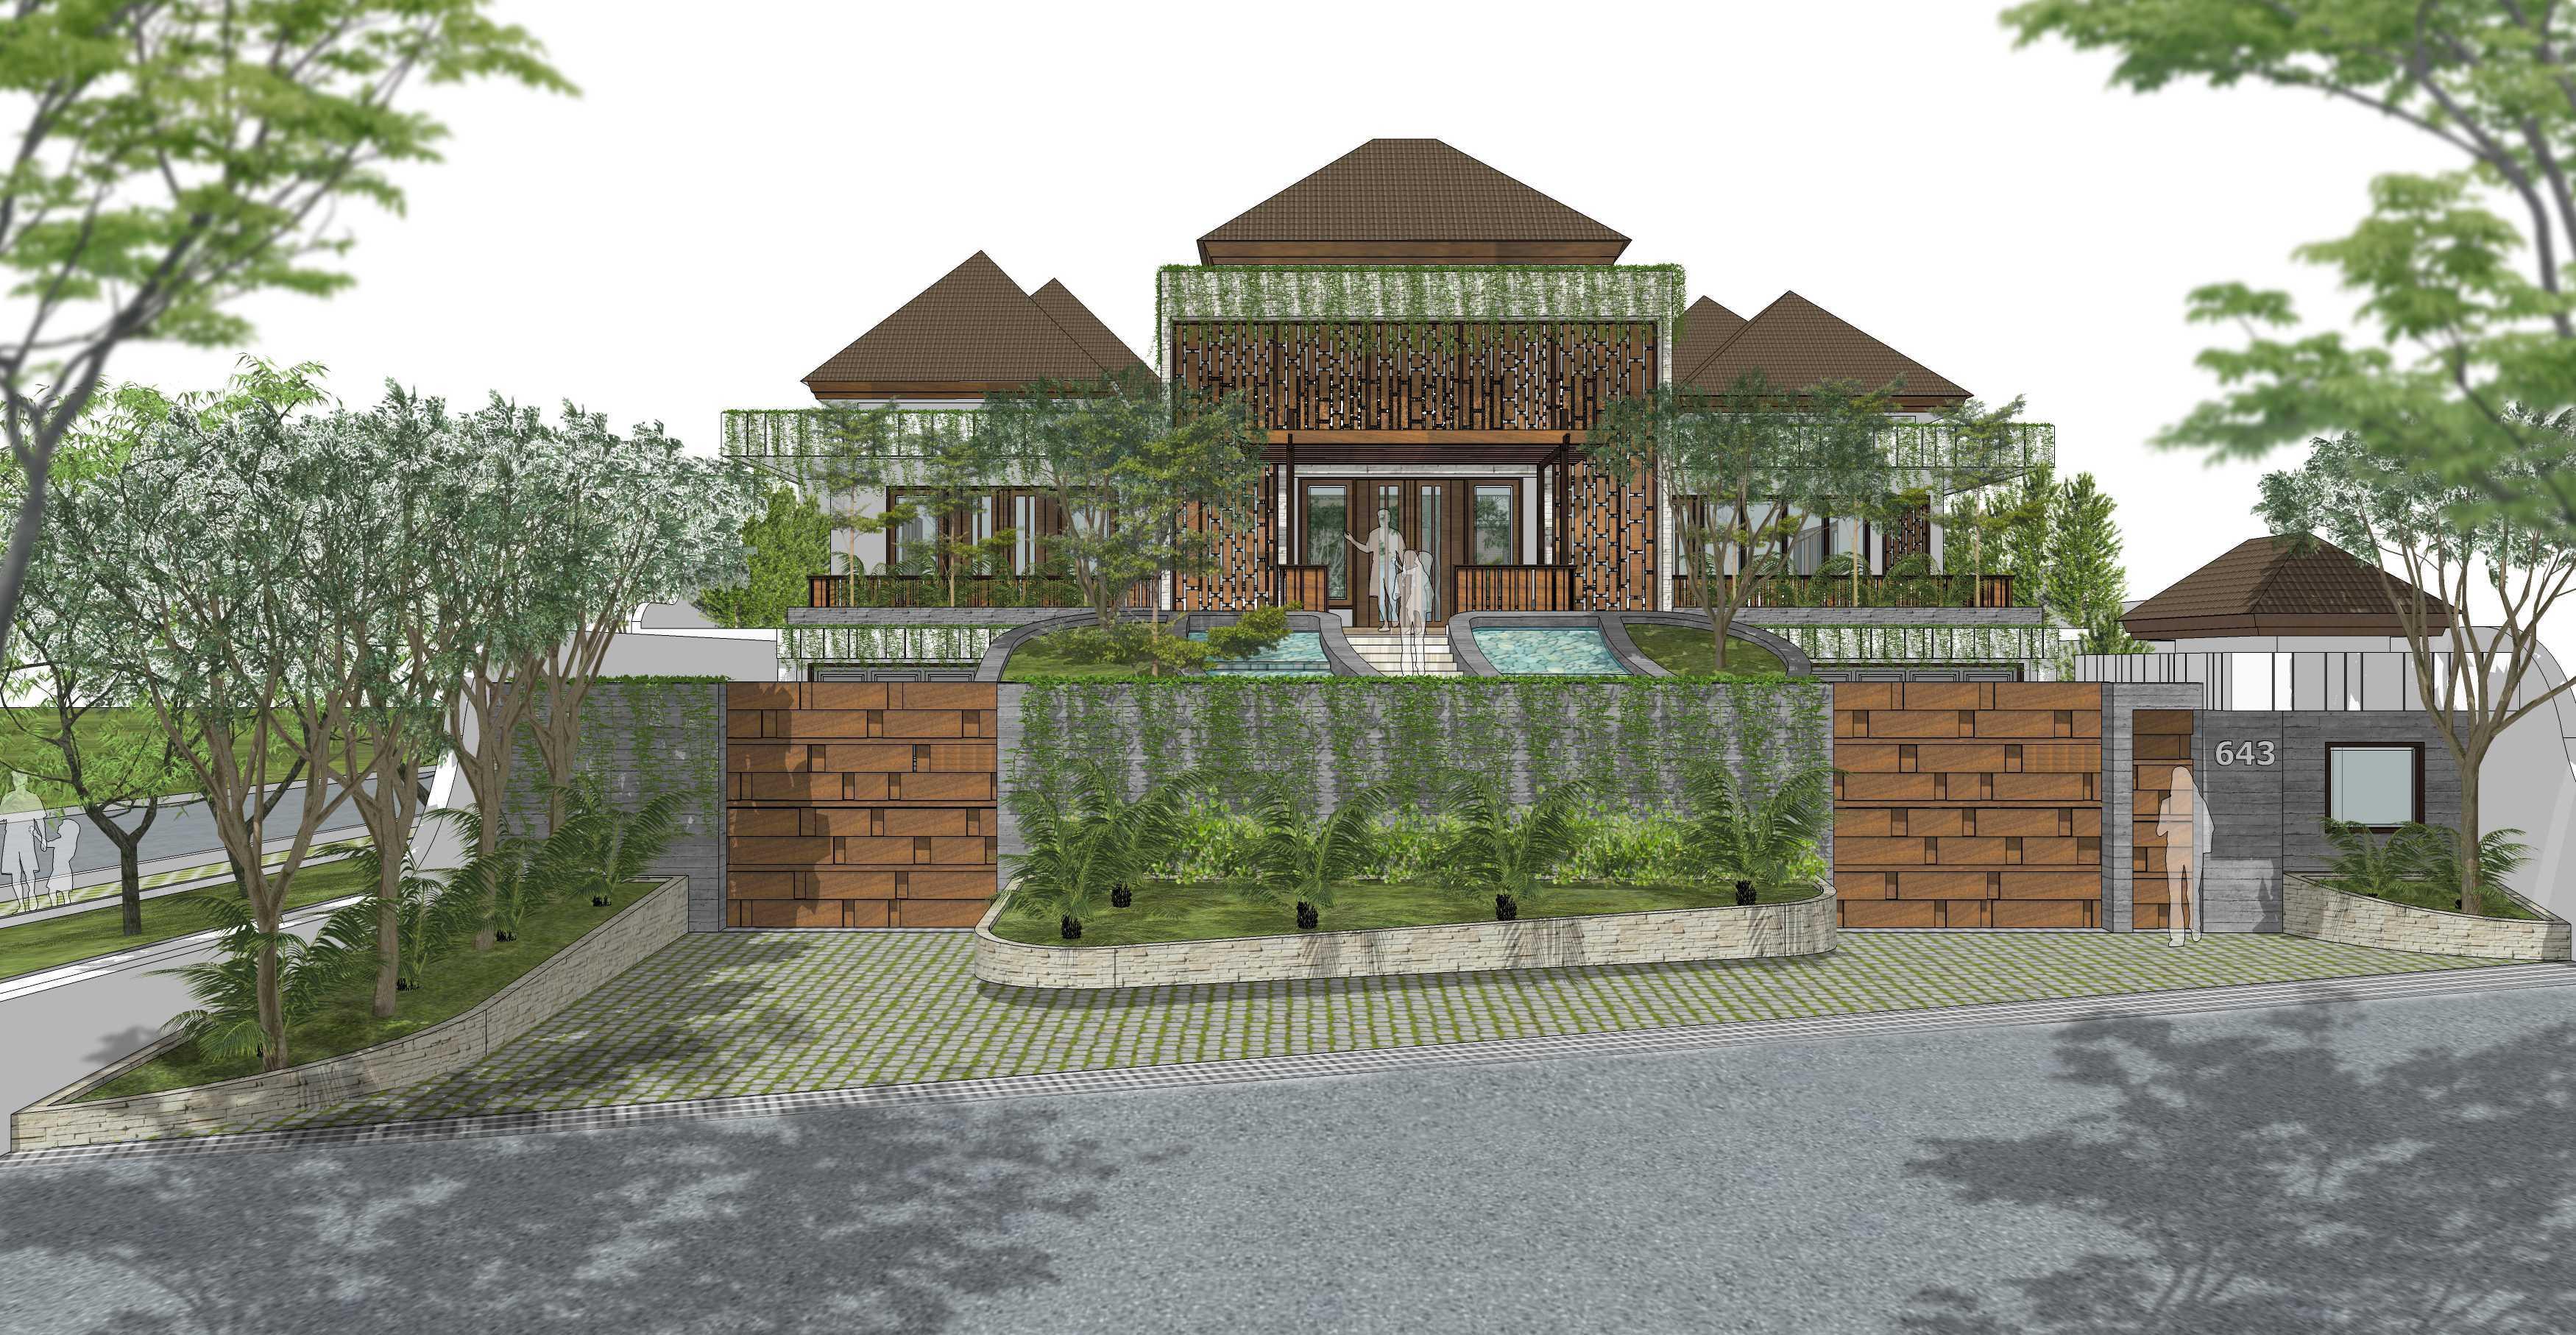 Miv Architects (Ar. Muhammad Ikhsan Hamiru, Iai & Partners) Rumah Sore  Soreang, Pare-Pare City, South Sulawesi, Indonesia Soreang, Pare-Pare City, South Sulawesi, Indonesia 1 Tropis  33943